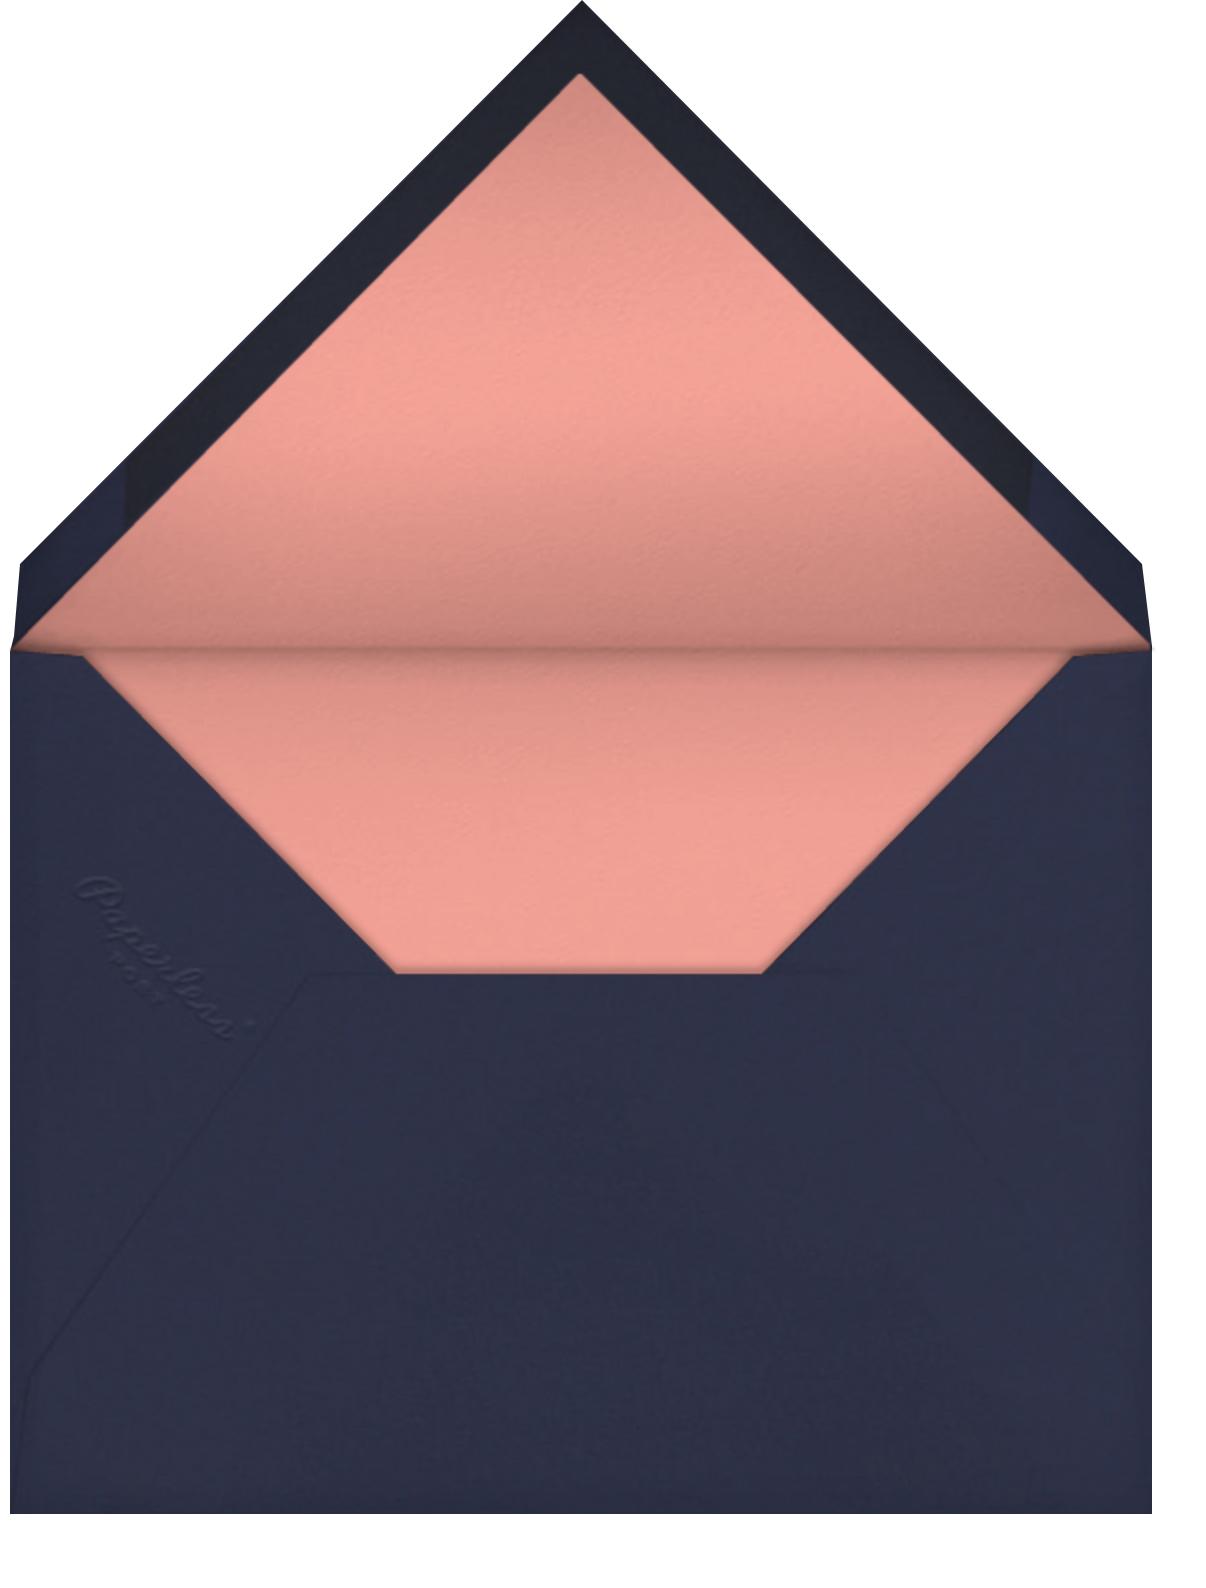 Slow Dance (Nicholas John Frith) - Red Cap Cards - Envelope